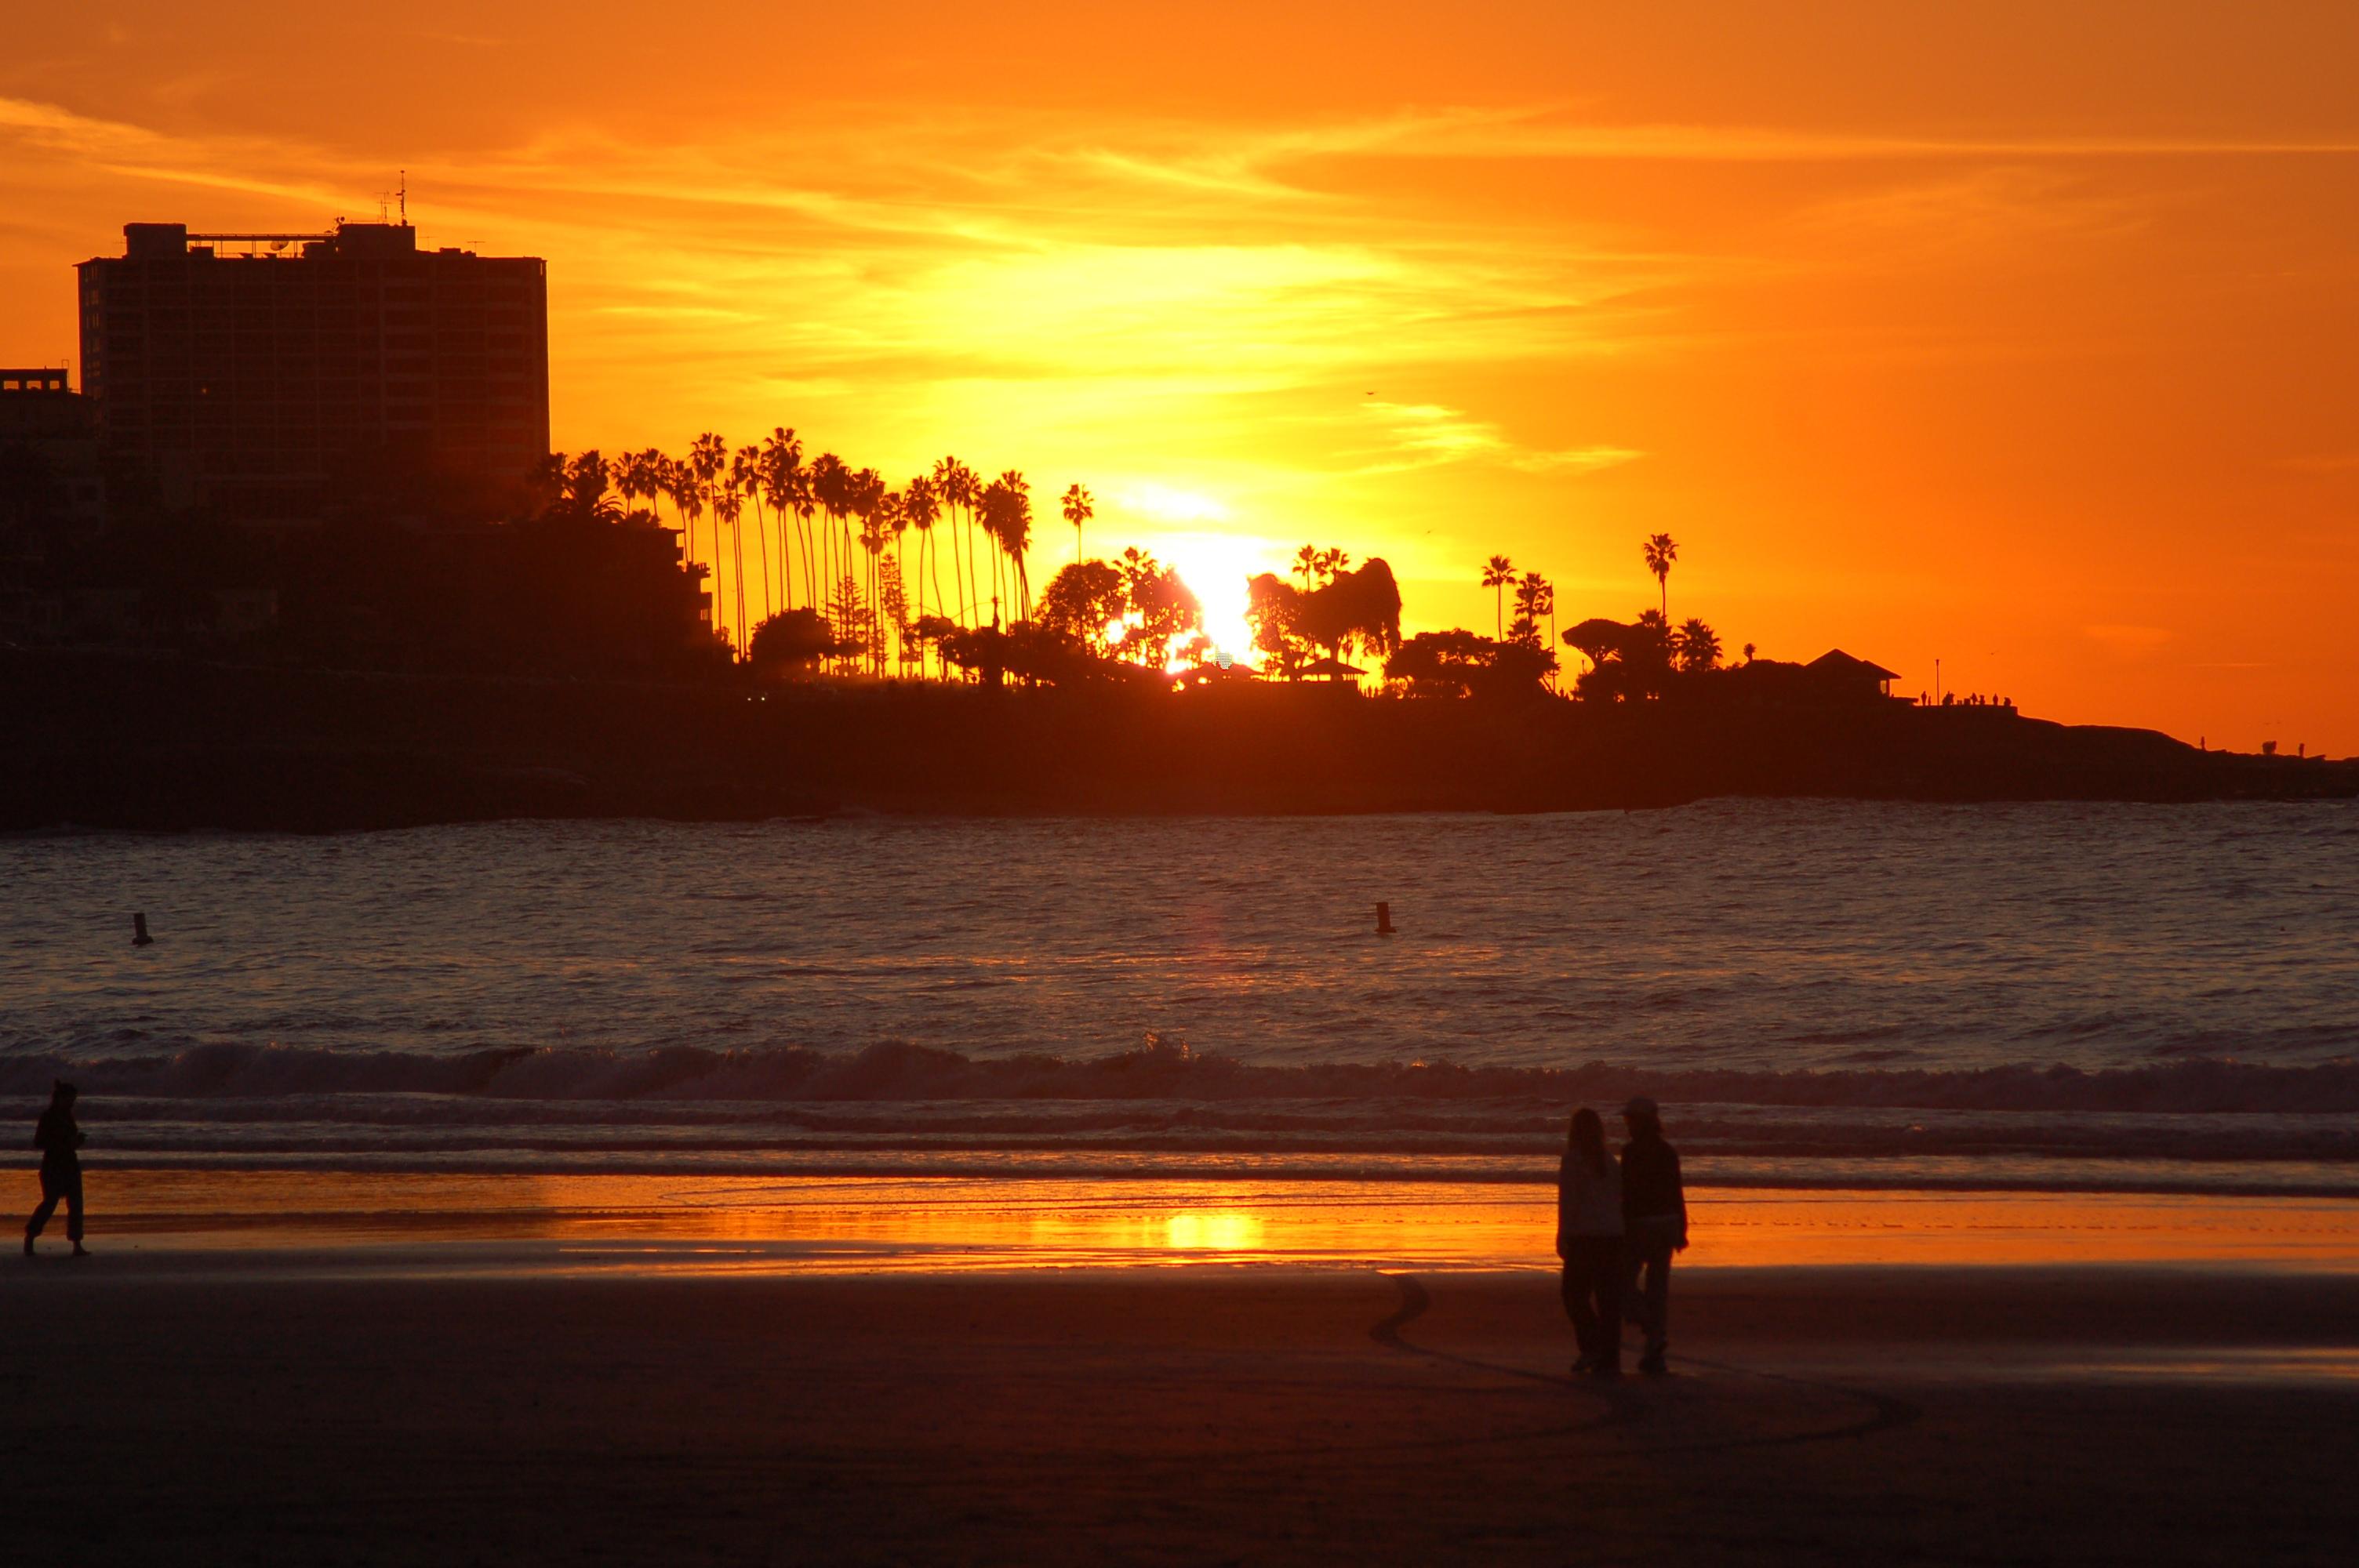 La Jolla Hotels >> Sunset from La Jolla Shores - San Diego Travel Blog